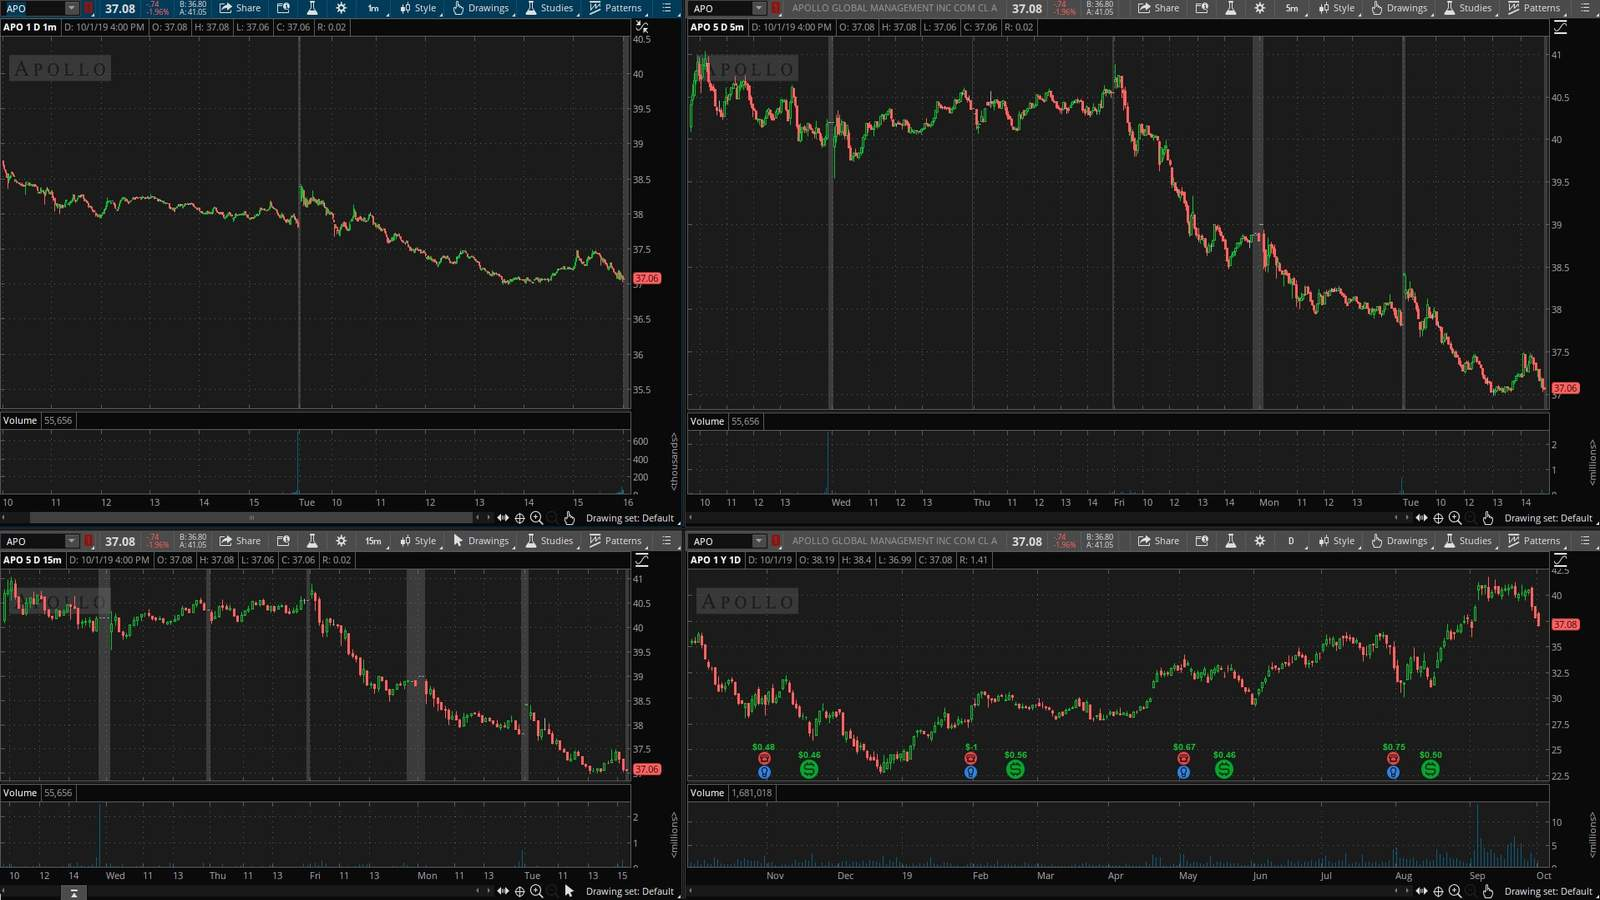 APO акция на фондовой бирже